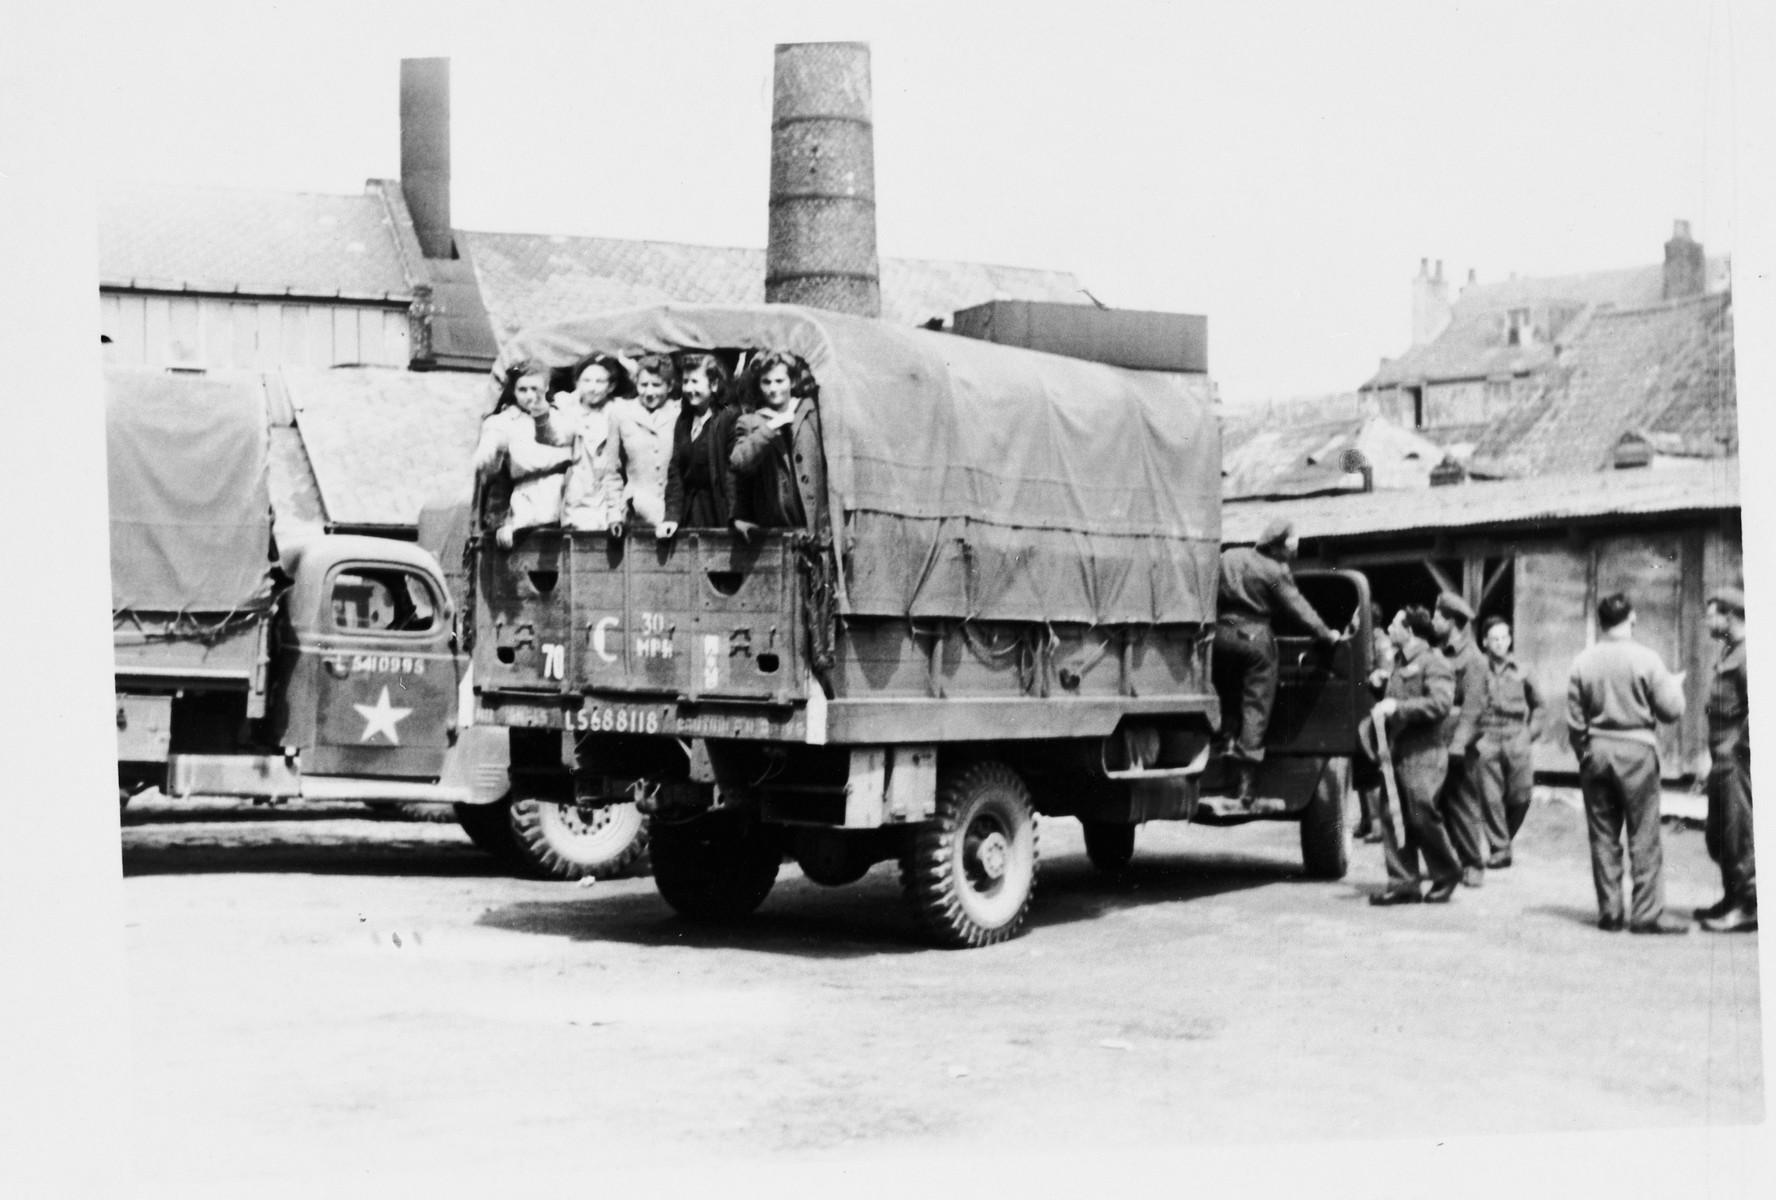 Jewish Brigade soldiers transport Jewish DPs by truck in The Netherlands.